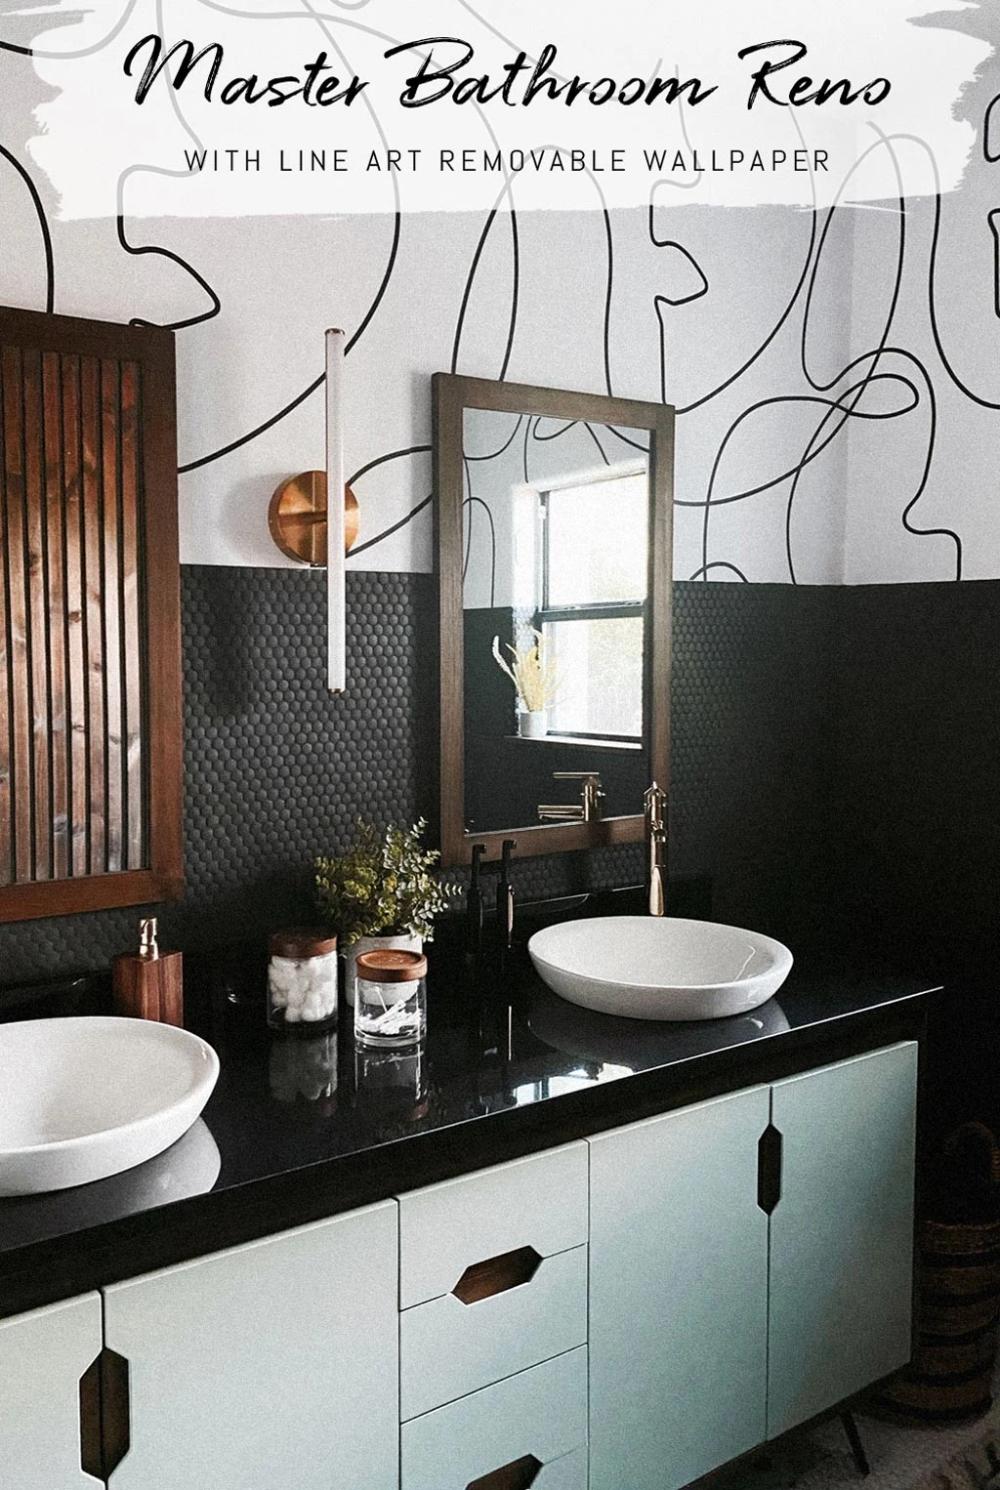 Master Bathroom Remodel Featuring Line Art Design Wallpaper Room Tou Livettes In 2020